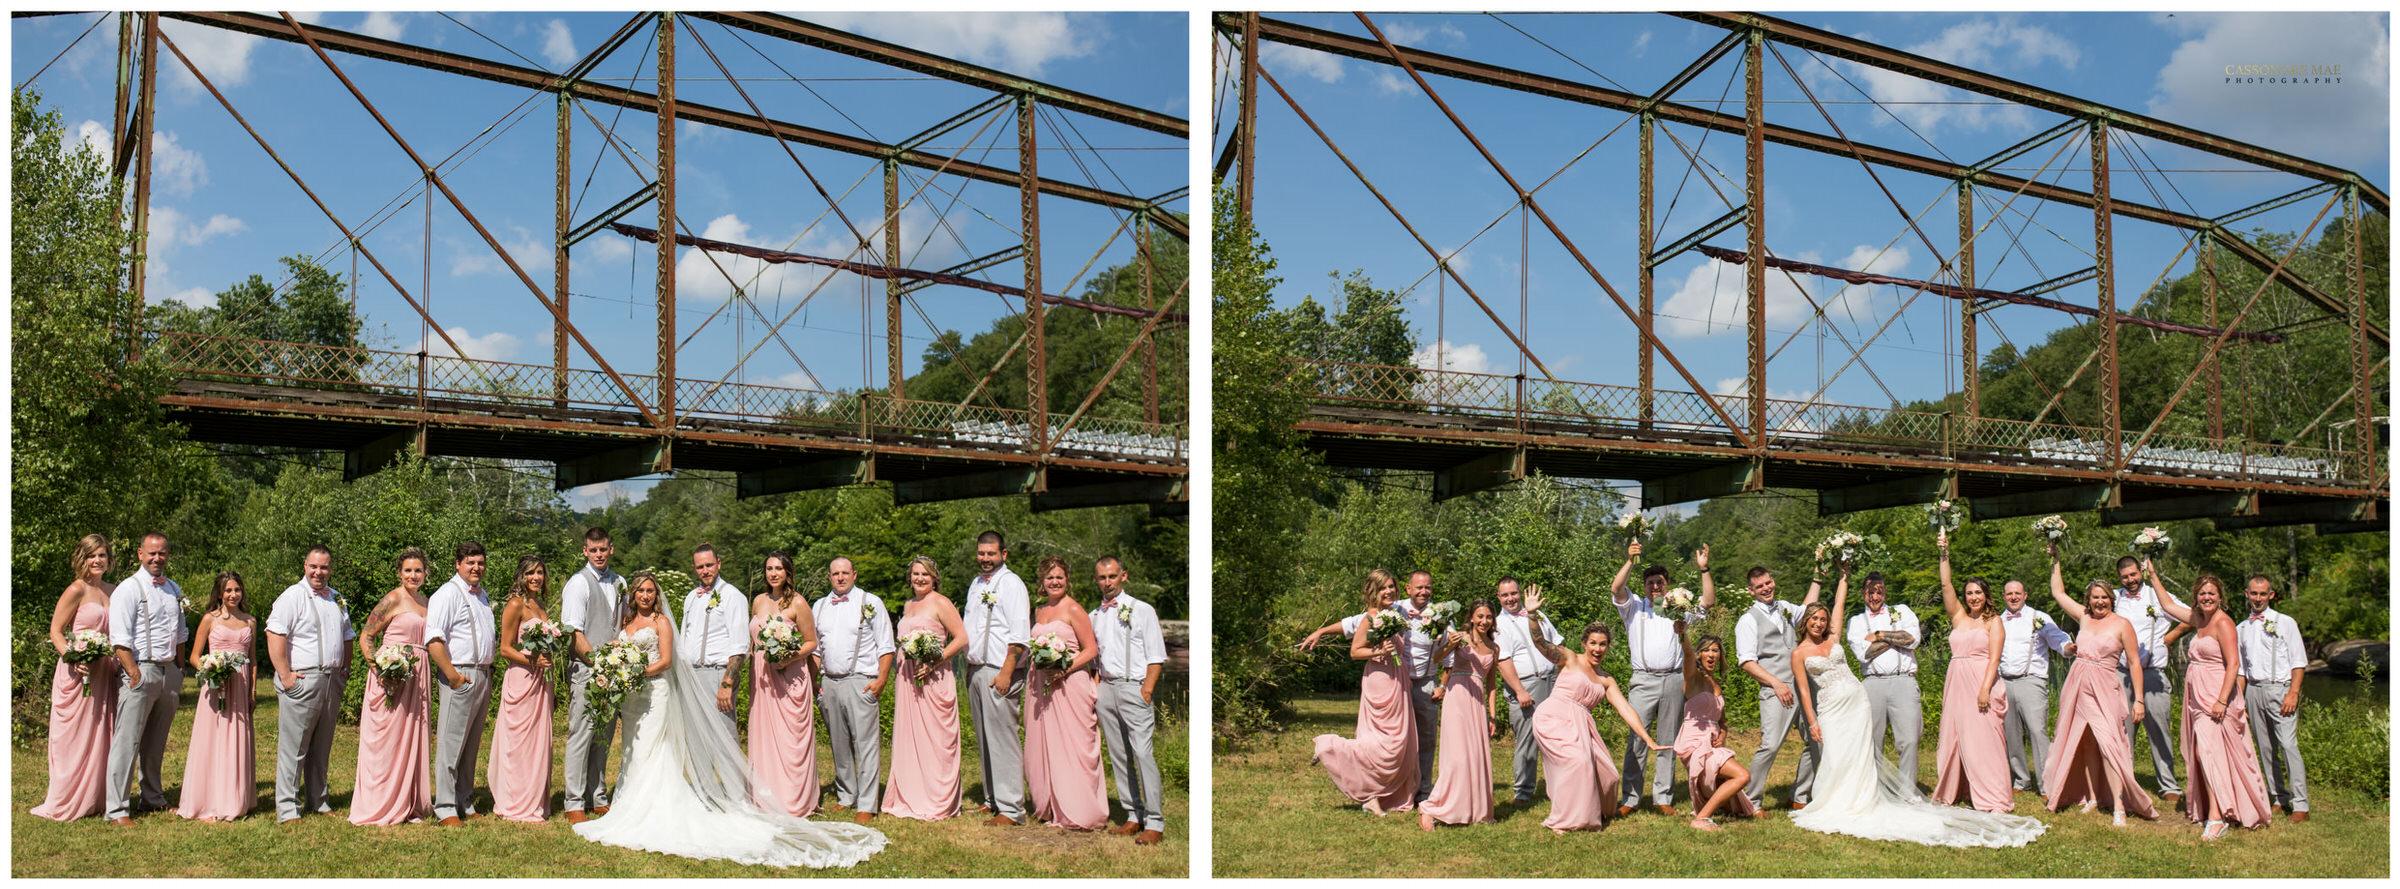 Cassondre Mae Photography Hudson Valley Wedding 18.jpg